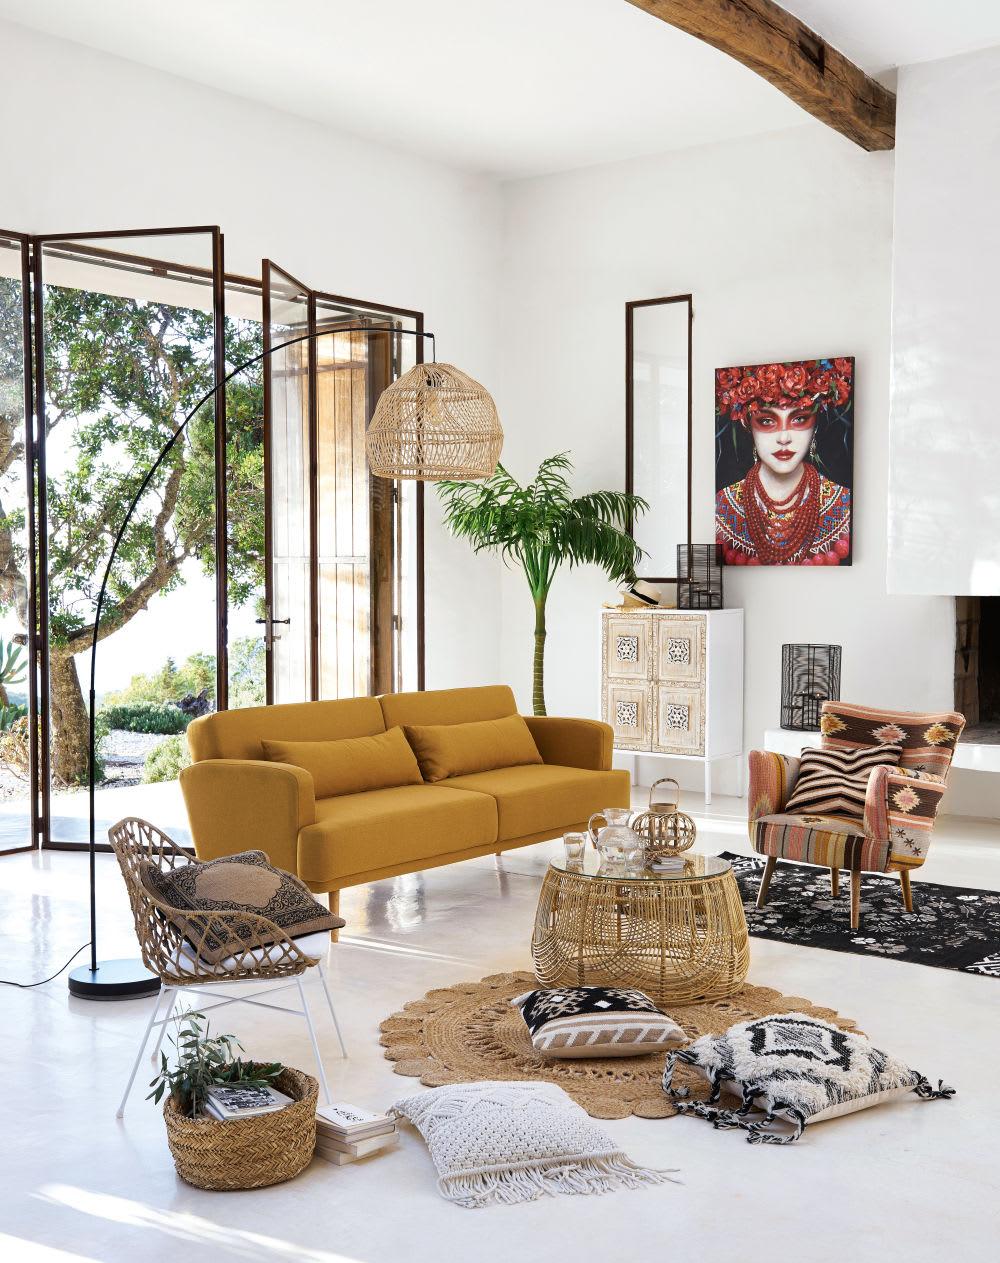 tapis rond en jute d150 marno maisons du monde. Black Bedroom Furniture Sets. Home Design Ideas